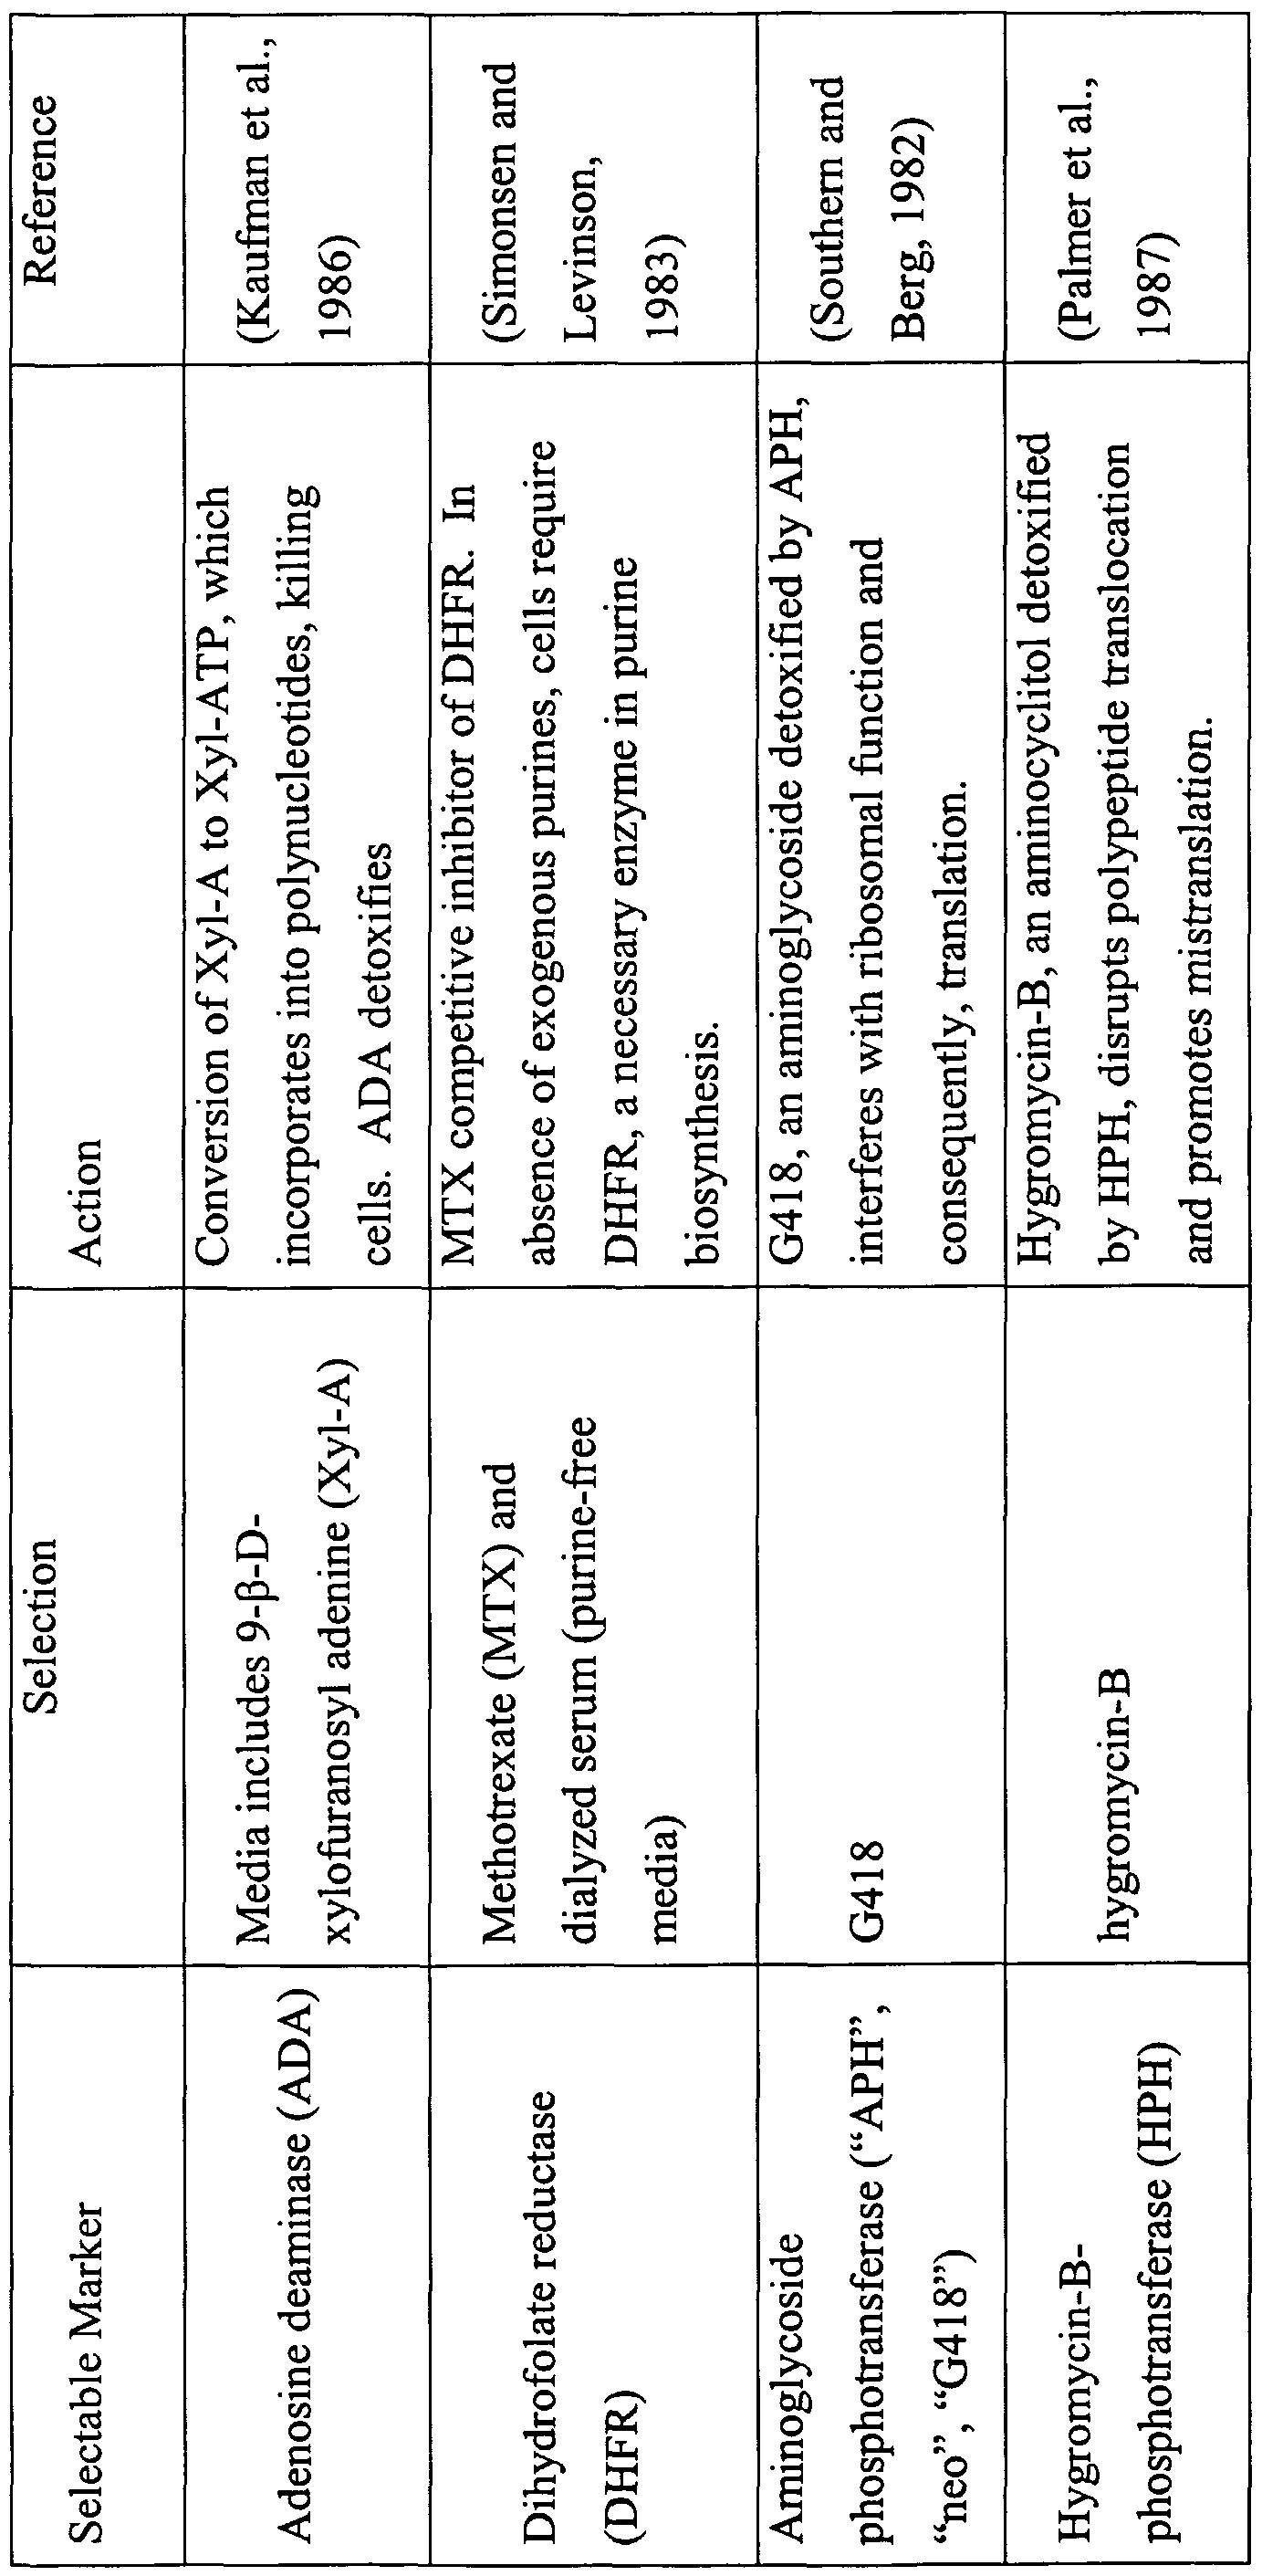 WO2003016553A2 - Gpcr-like retinoic acid-induced gene 1 protein and